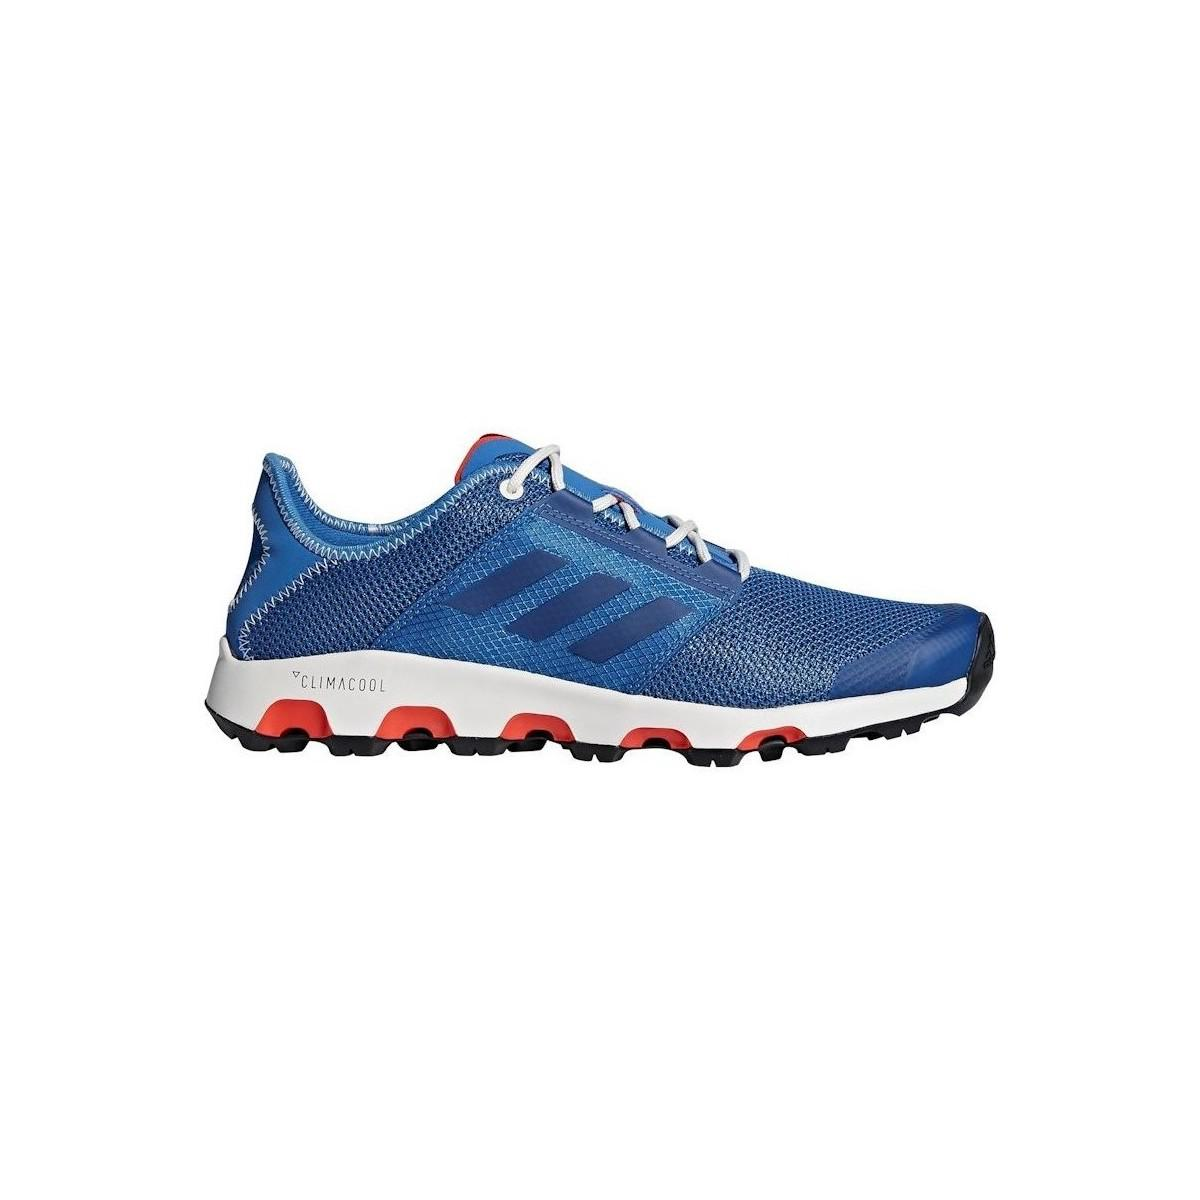 lyst adidas terrex cc - scarpe da uomo (formatori) in blu